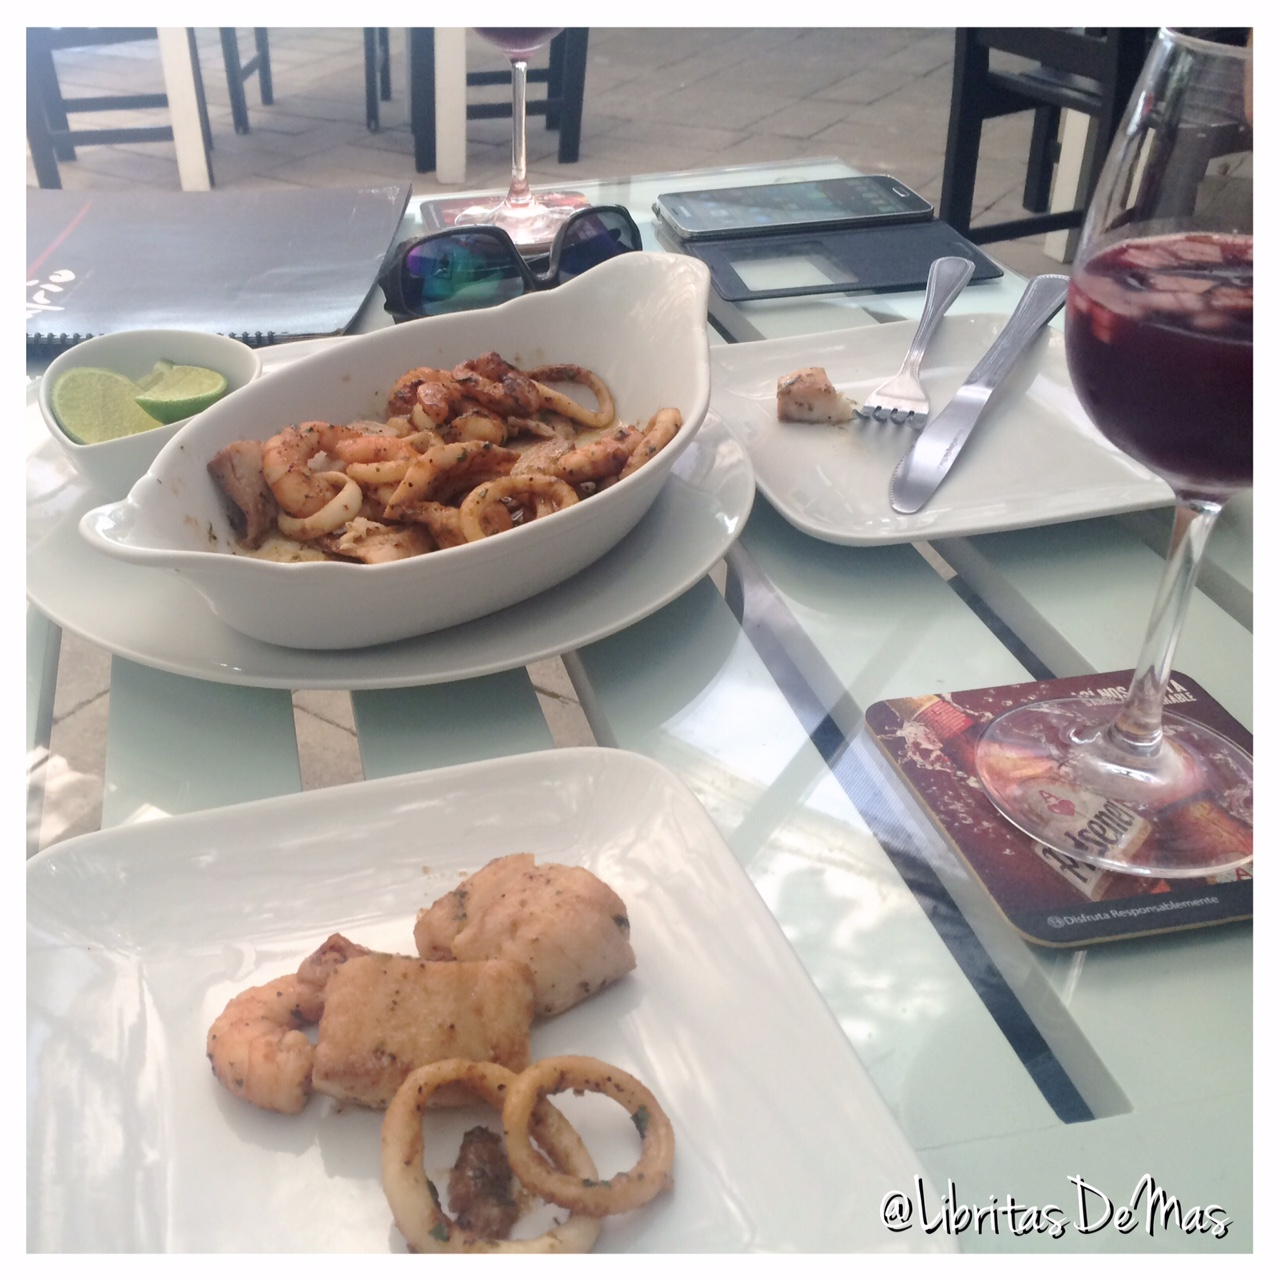 Buscando un sabadito relax… ATRIO #FoodReview